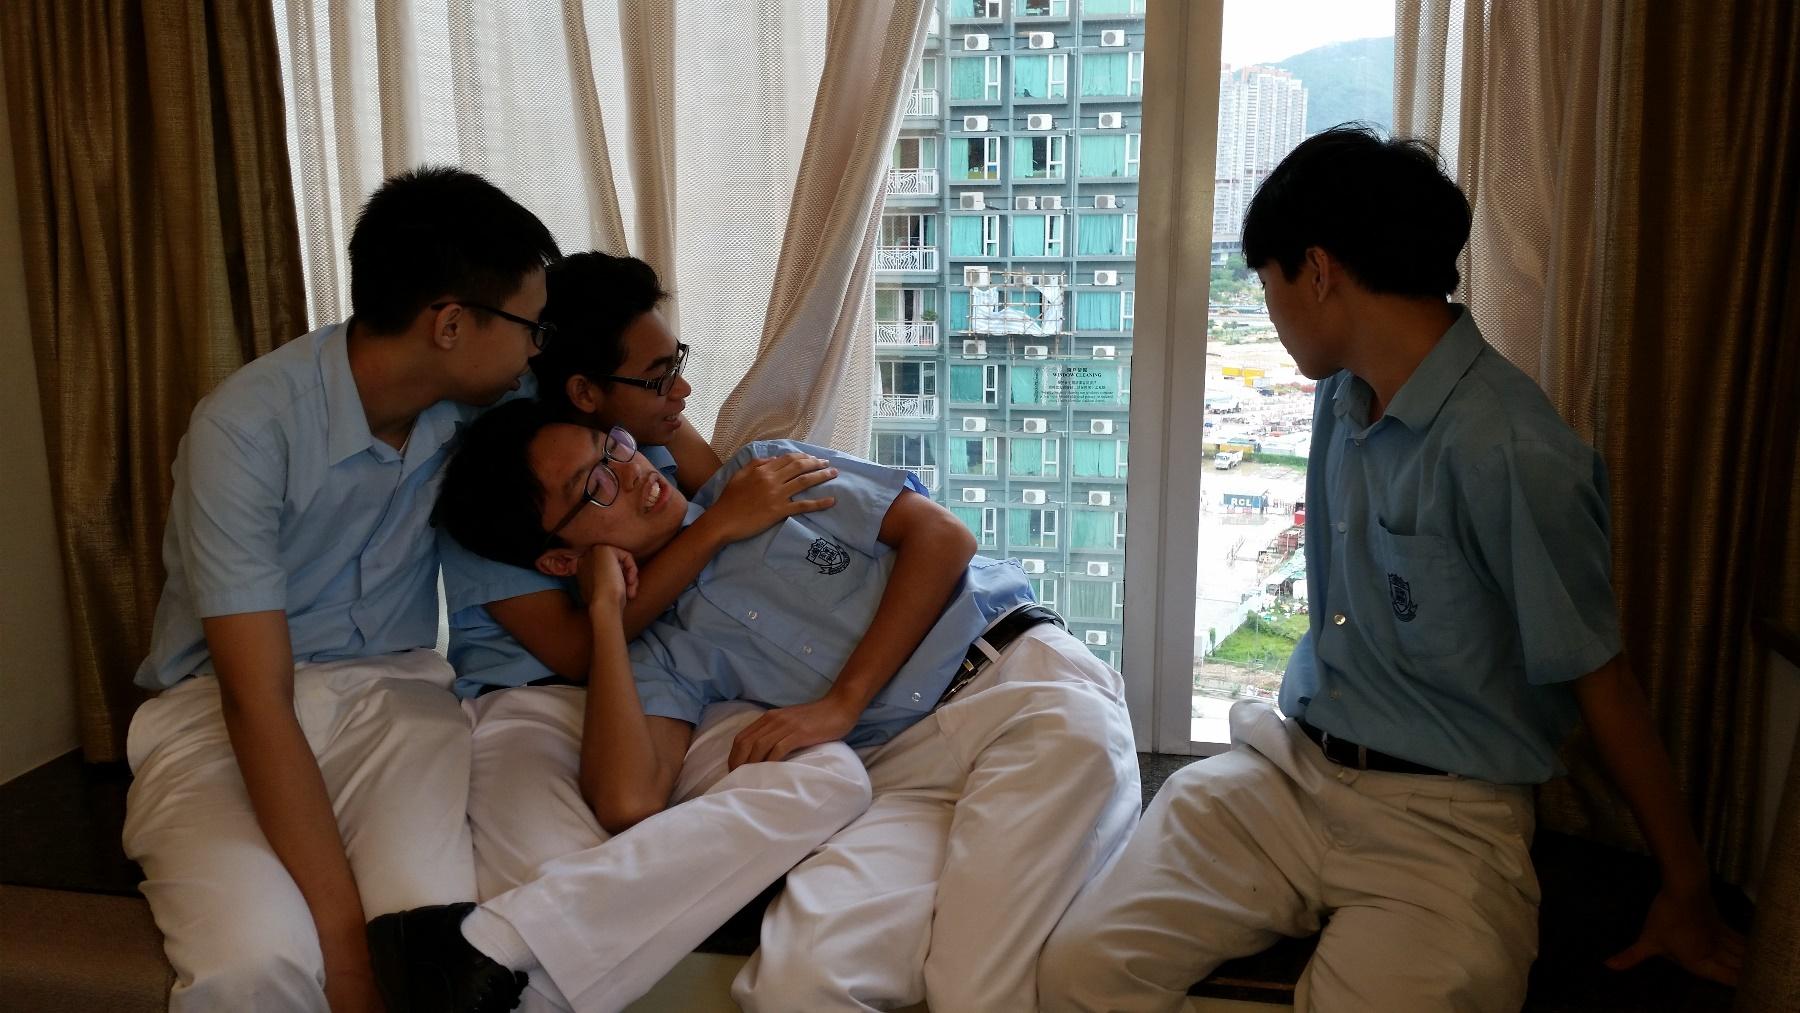 http://www.npc.edu.hk/sites/default/files/20170707_152528.jpg